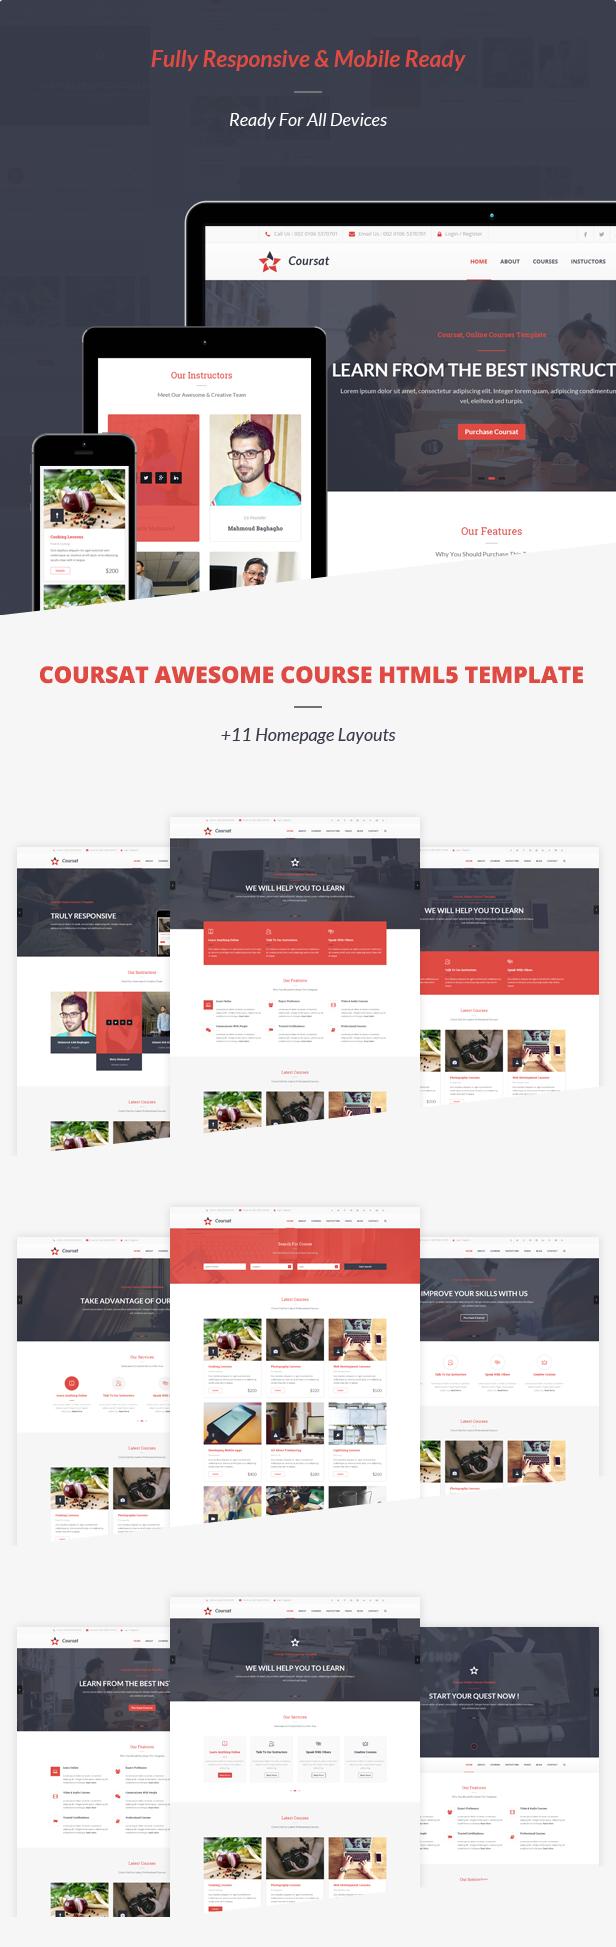 Coursat – Responsive Course HTML5 Site Template